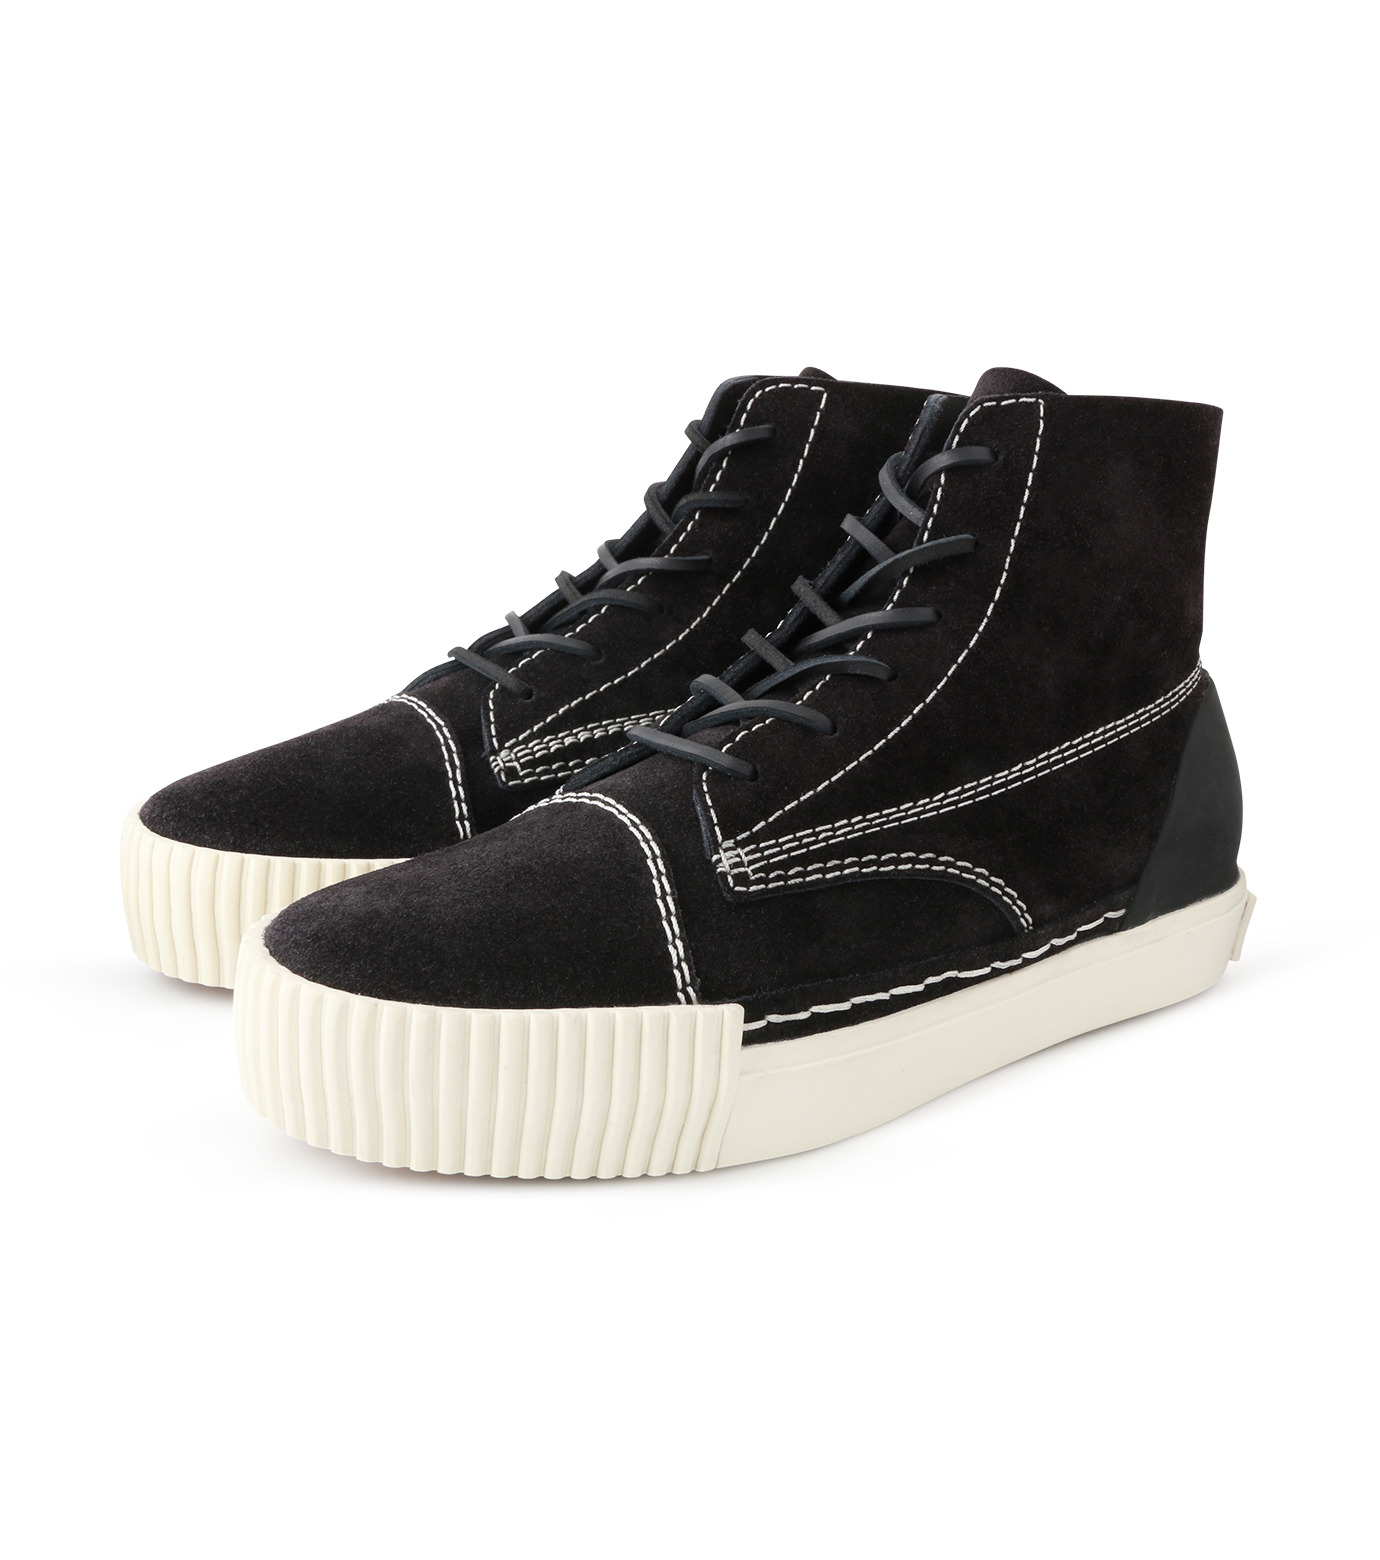 Alexander Wang(アレキサンダーワン)のHicut Sneaker-BLACK(スニーカー/sneaker)-315122F16-13 拡大詳細画像3